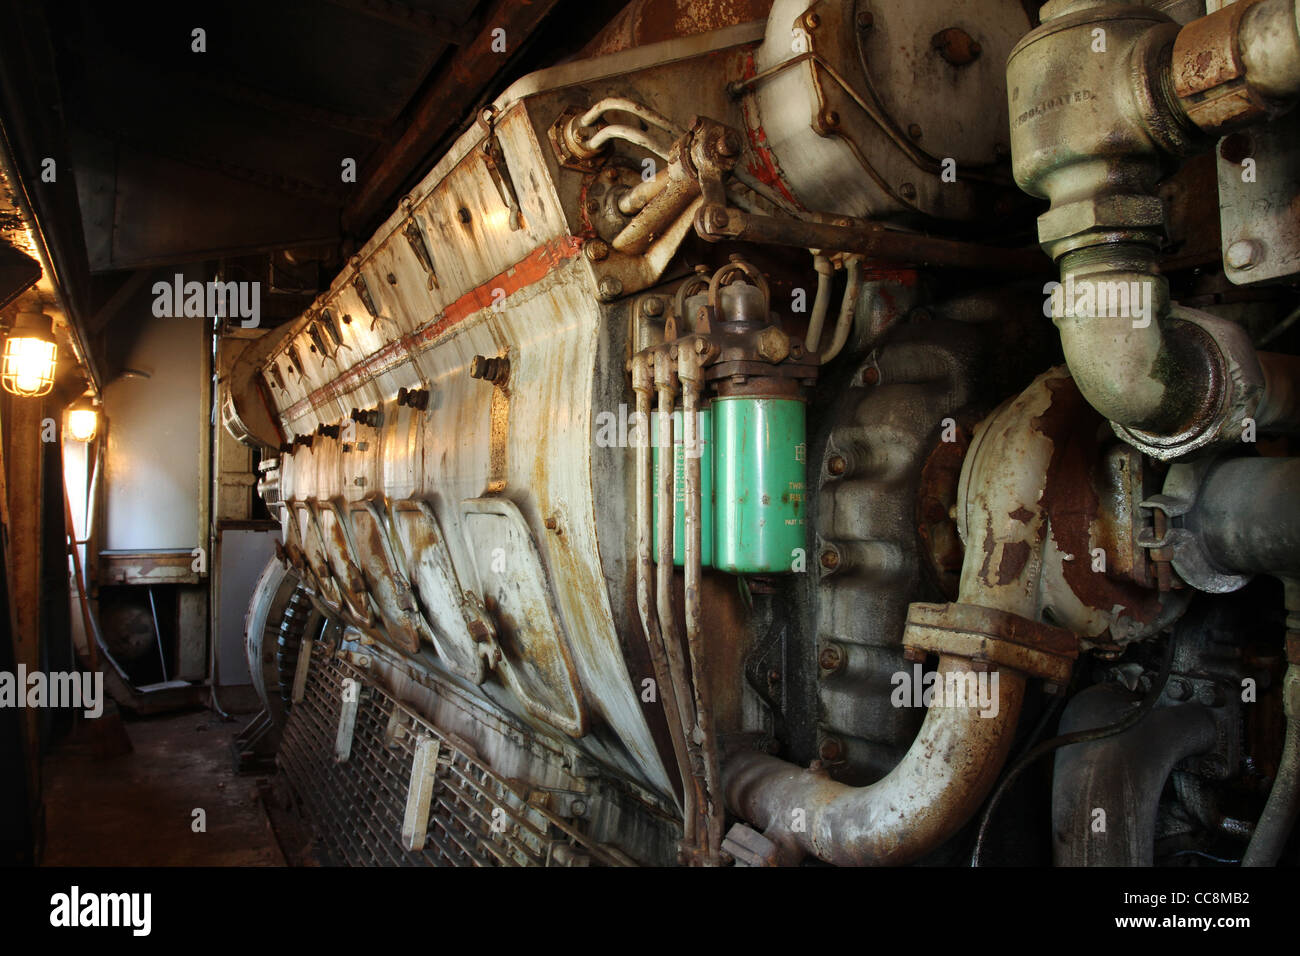 Locomotive Diesel Engine. Pennsylvania Railroad locomotive 5888. - Stock Image